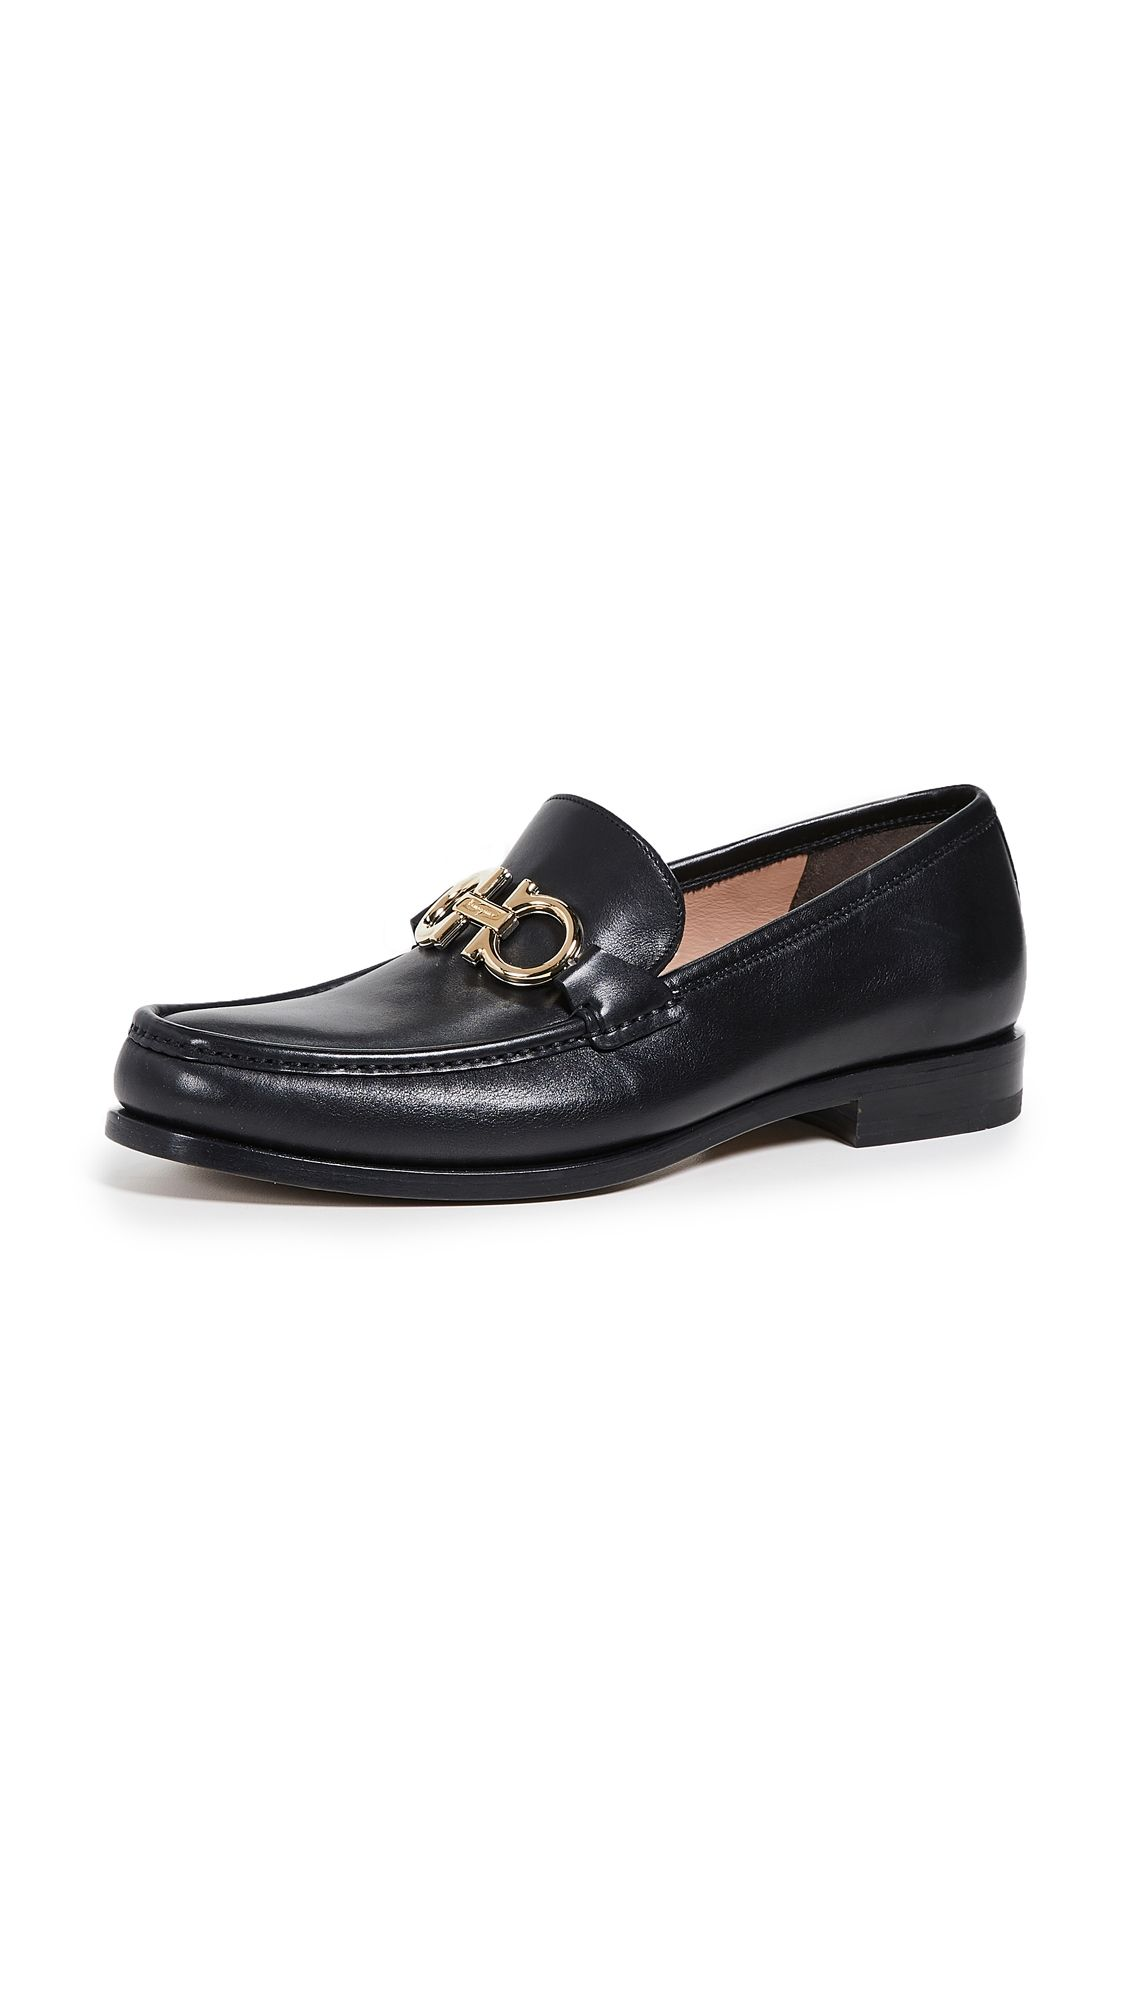 black bit loafers